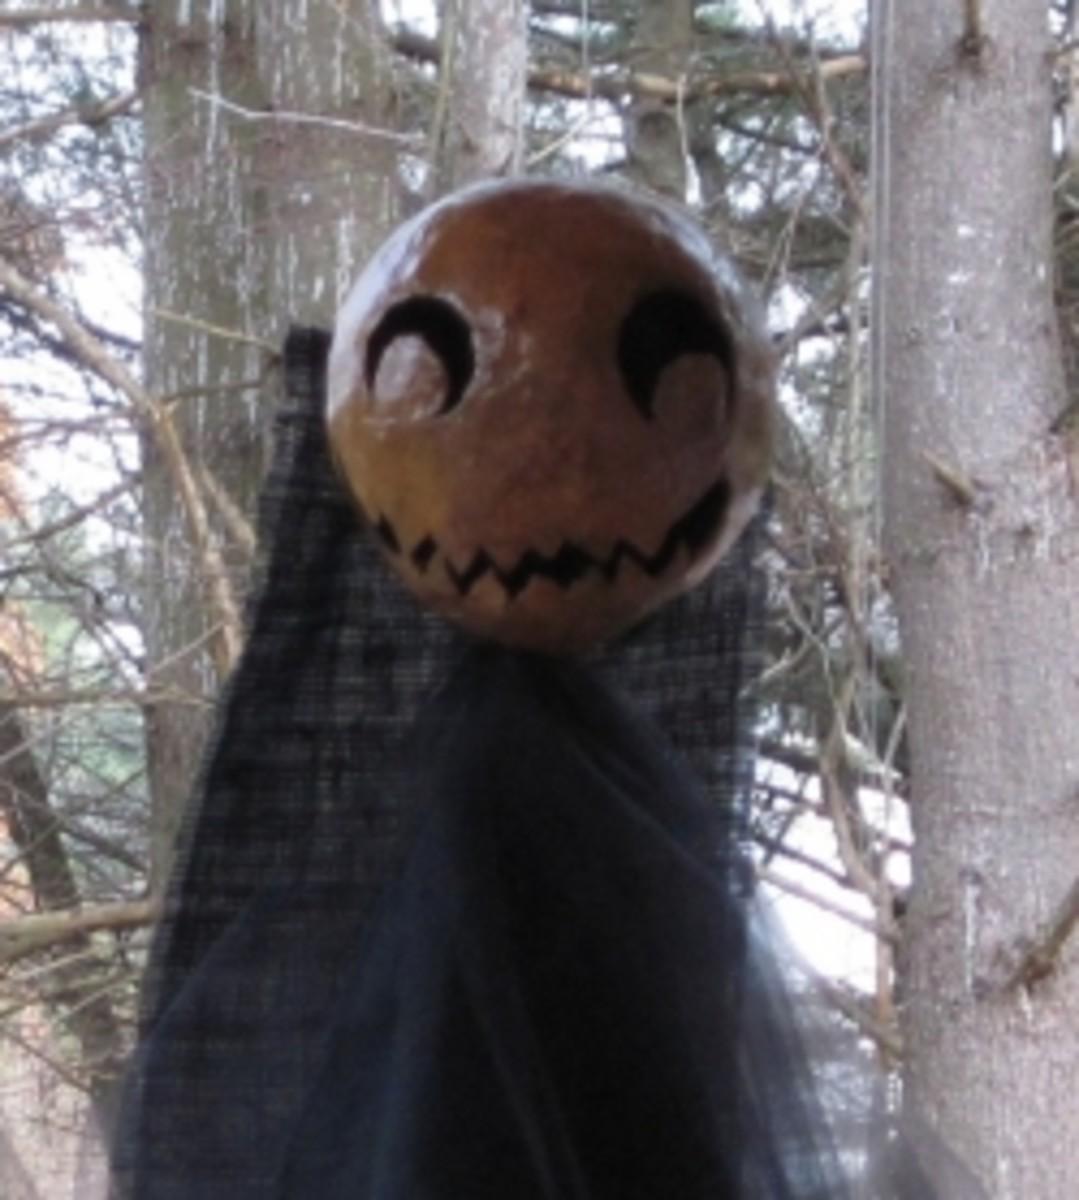 Paper mache spooky Halloween decoration